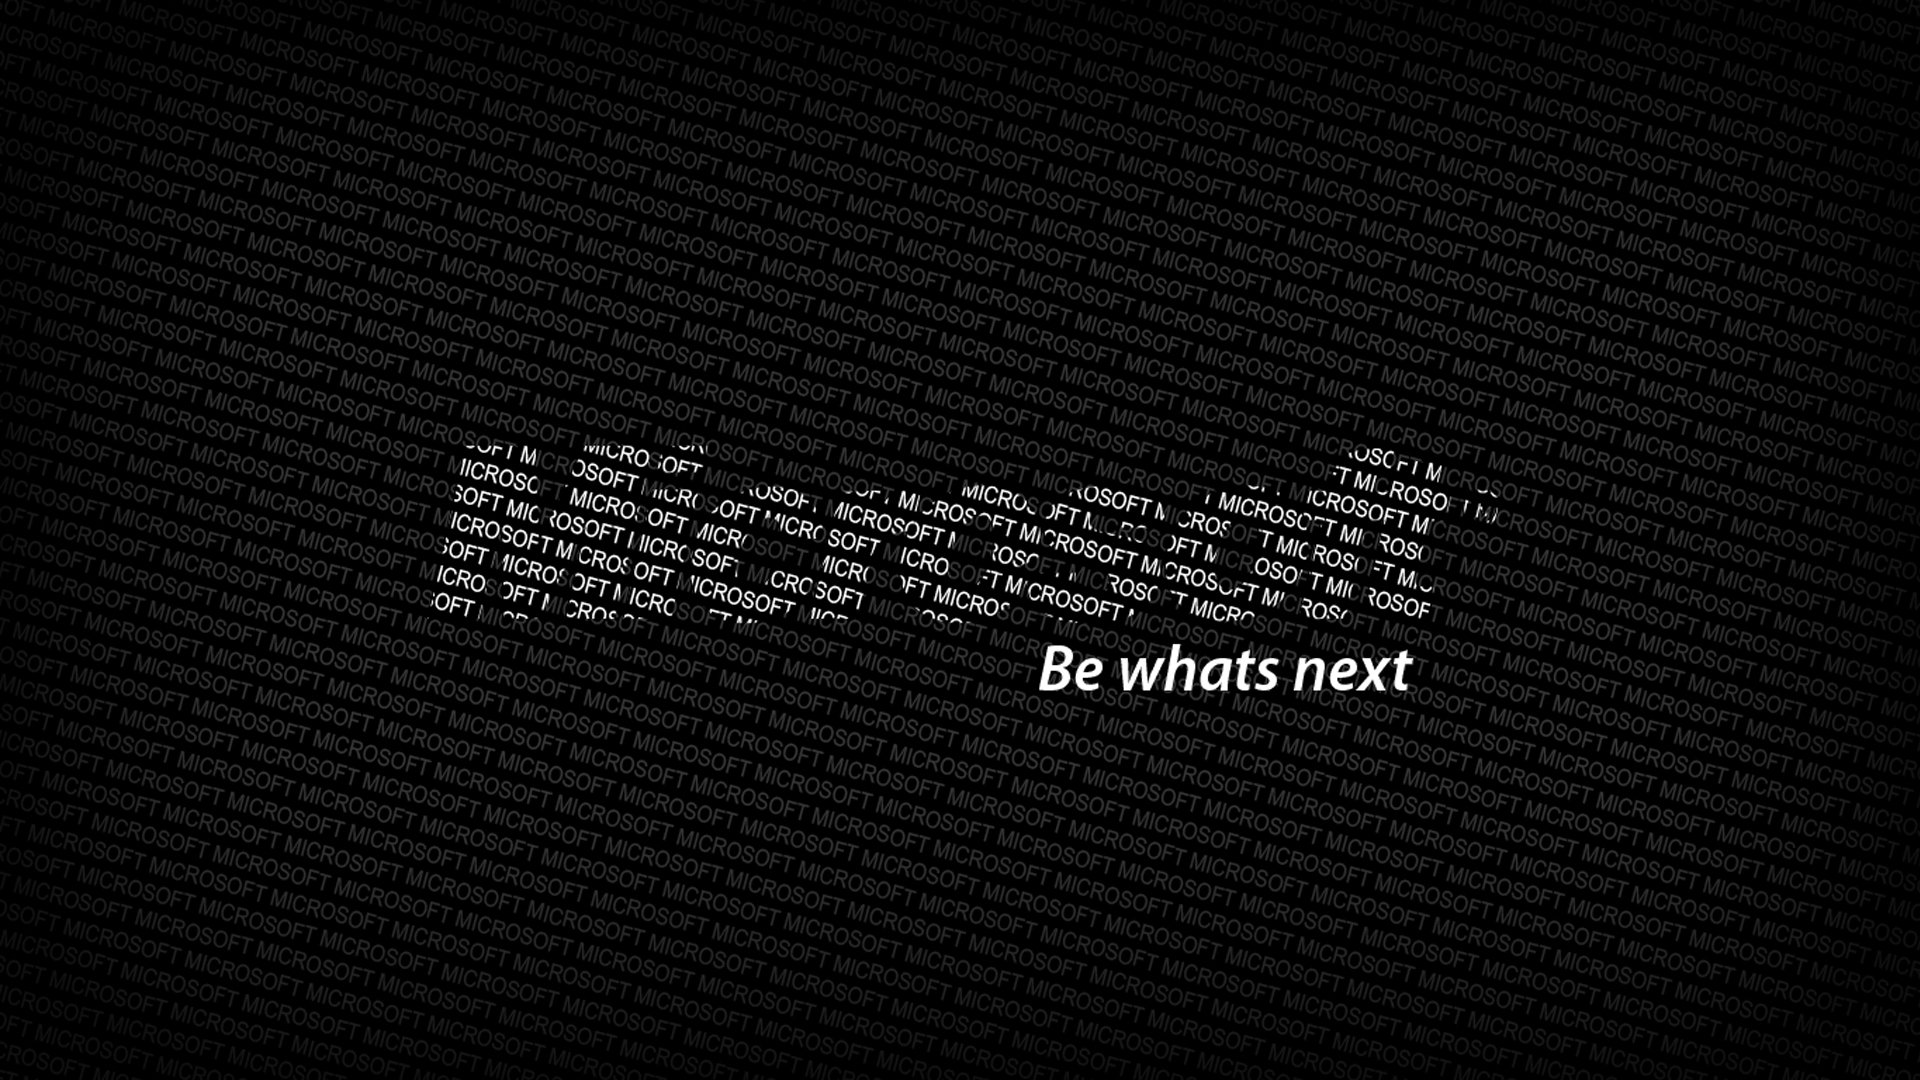 Microsoft Wallpaper 16